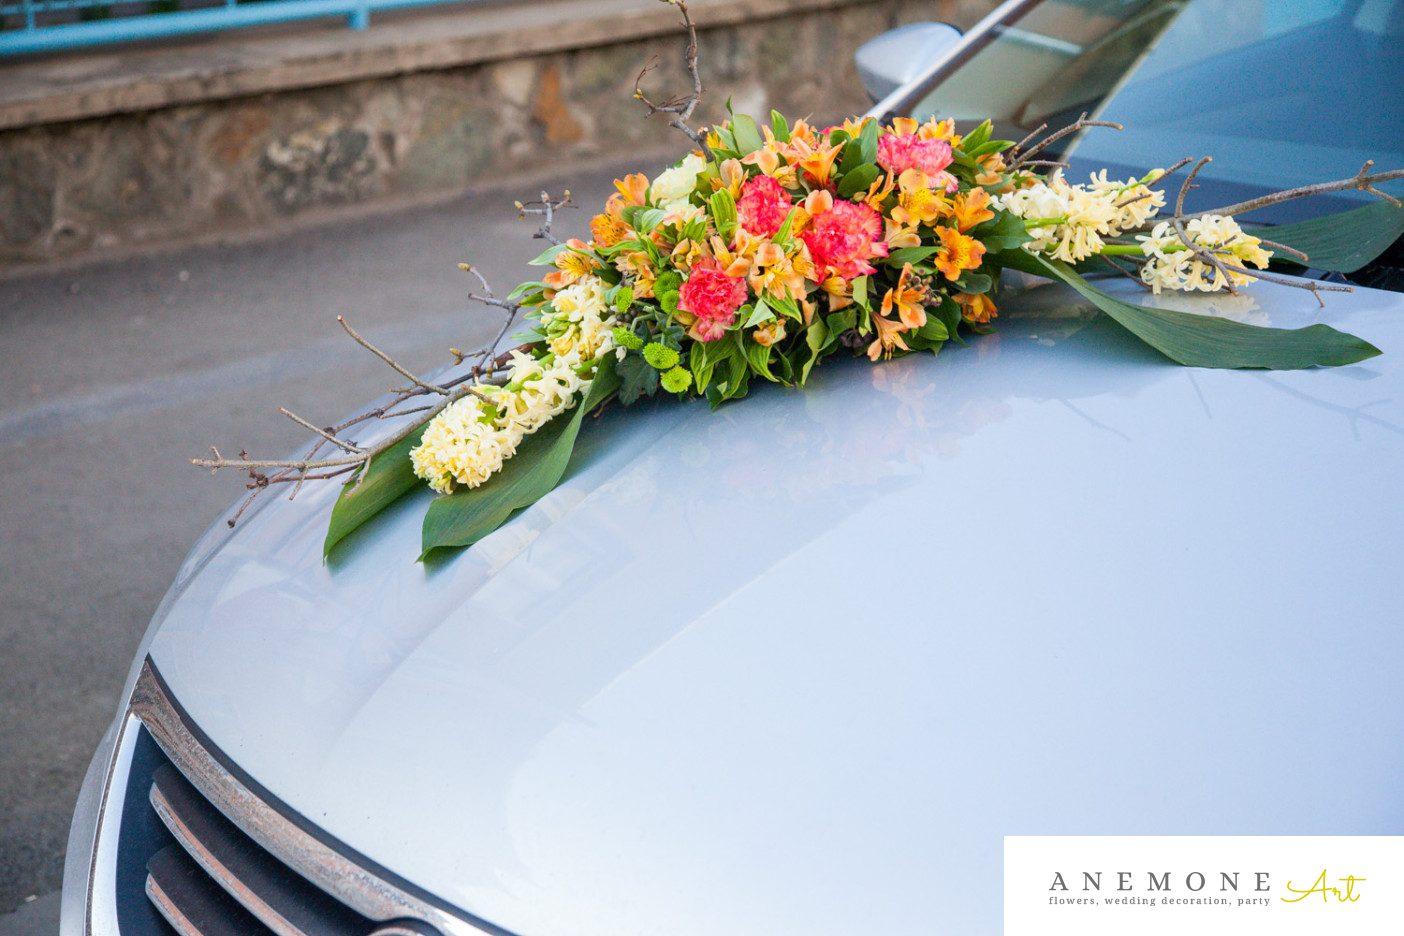 Poza, foto cu Flori de nunta crengi, decor masina, maro, portocaliu, toamna in Arad, Timisoara, Oradea (wedding flowers, bouquets) nunta Arad, Timisoara, Oradea